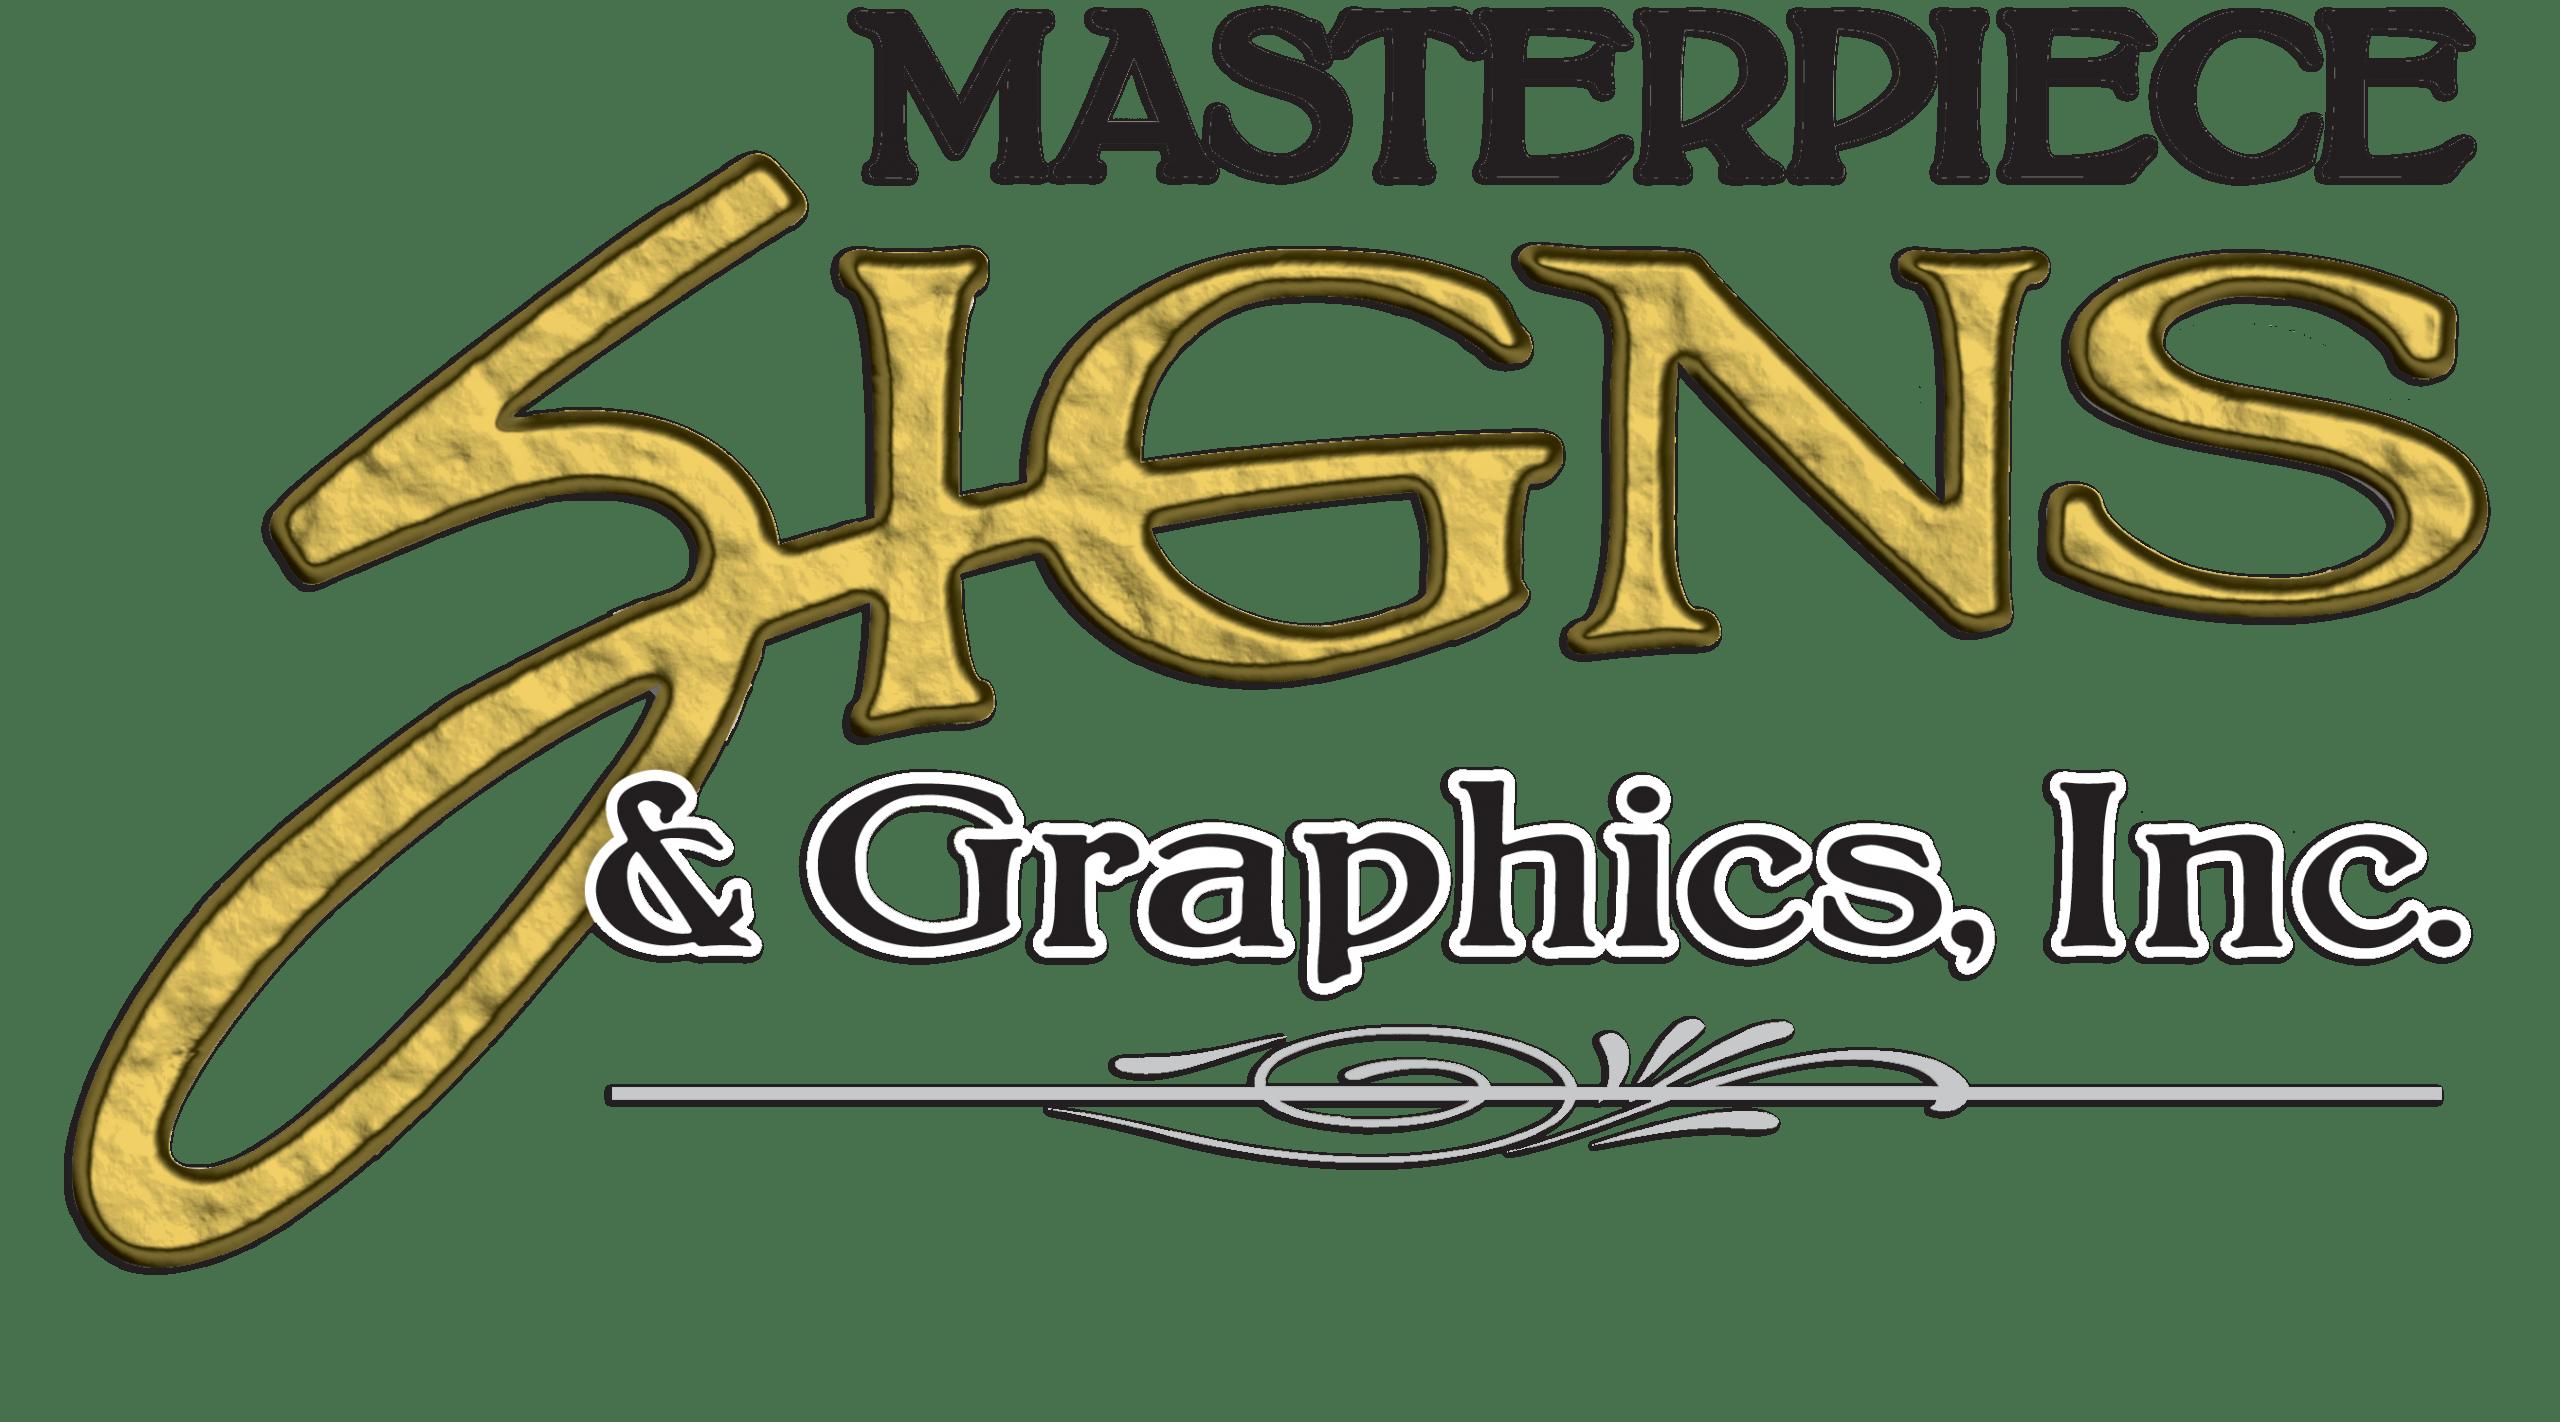 Masterpiece Signs & Graphics, Inc.